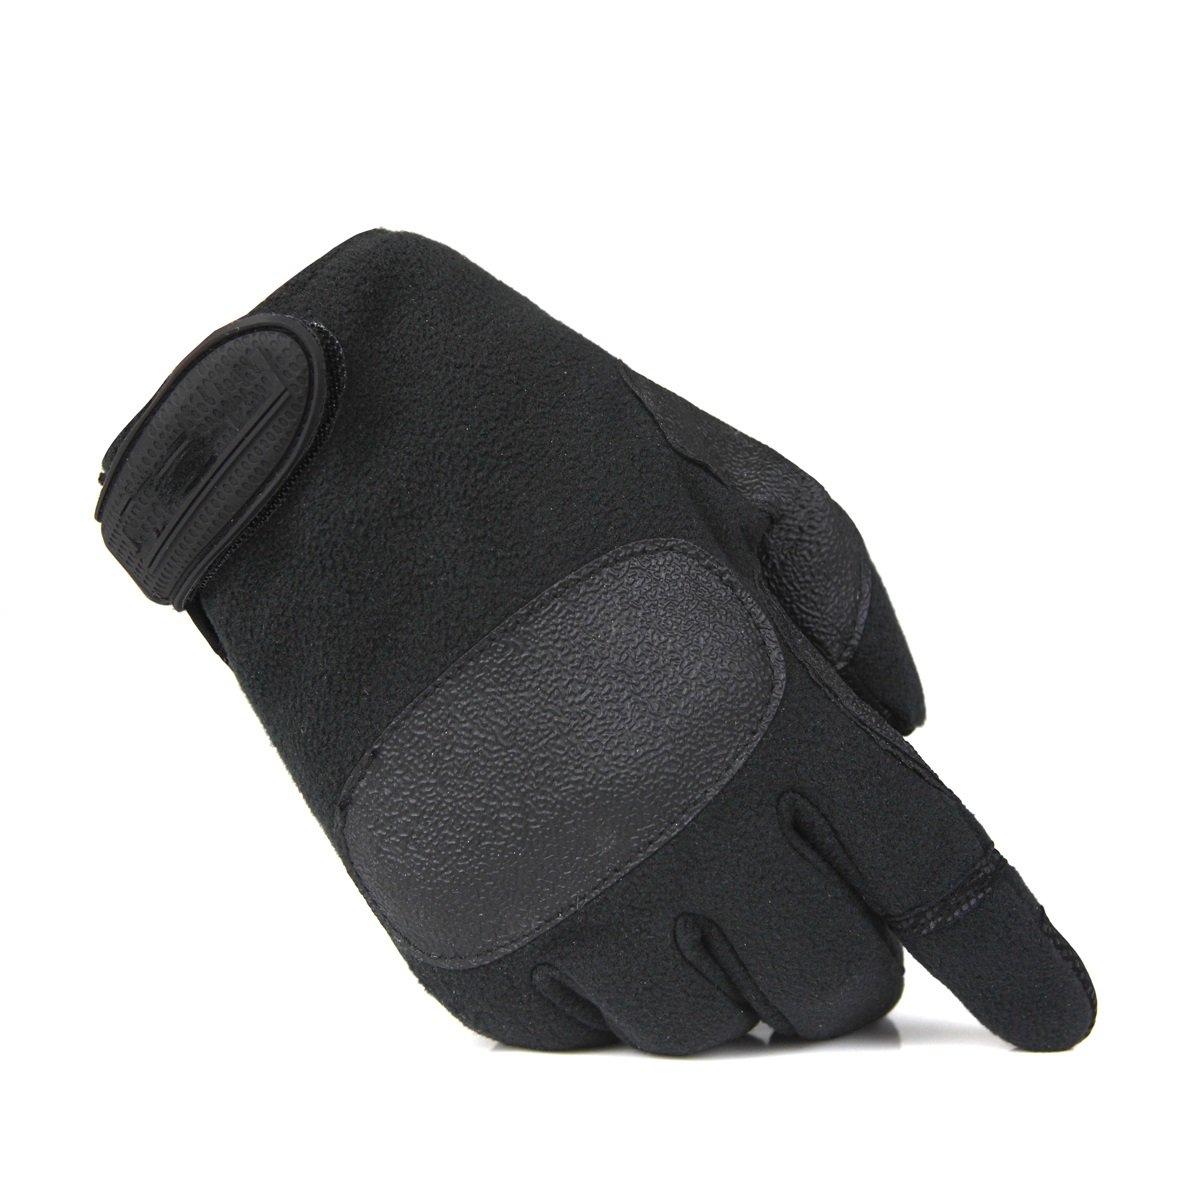 ФОТО Fleece anti-skid wear-resistant riding climbing climbing training full-finger gloves